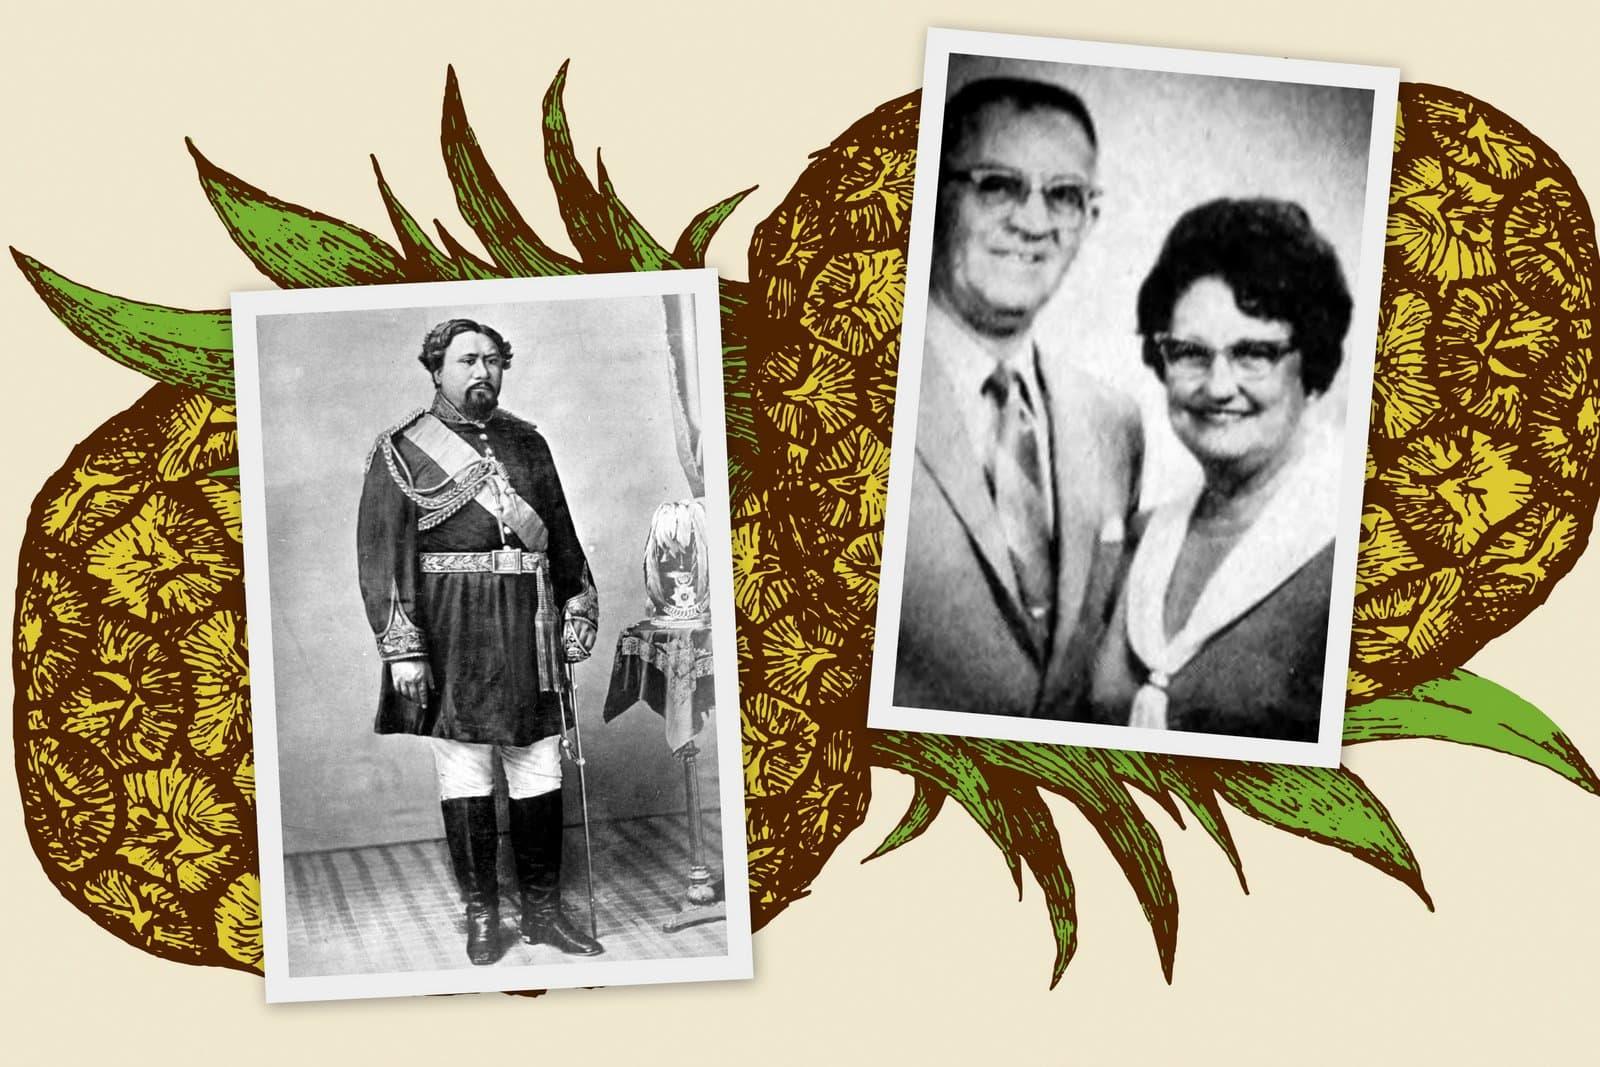 Kamehameha V and his pie creator